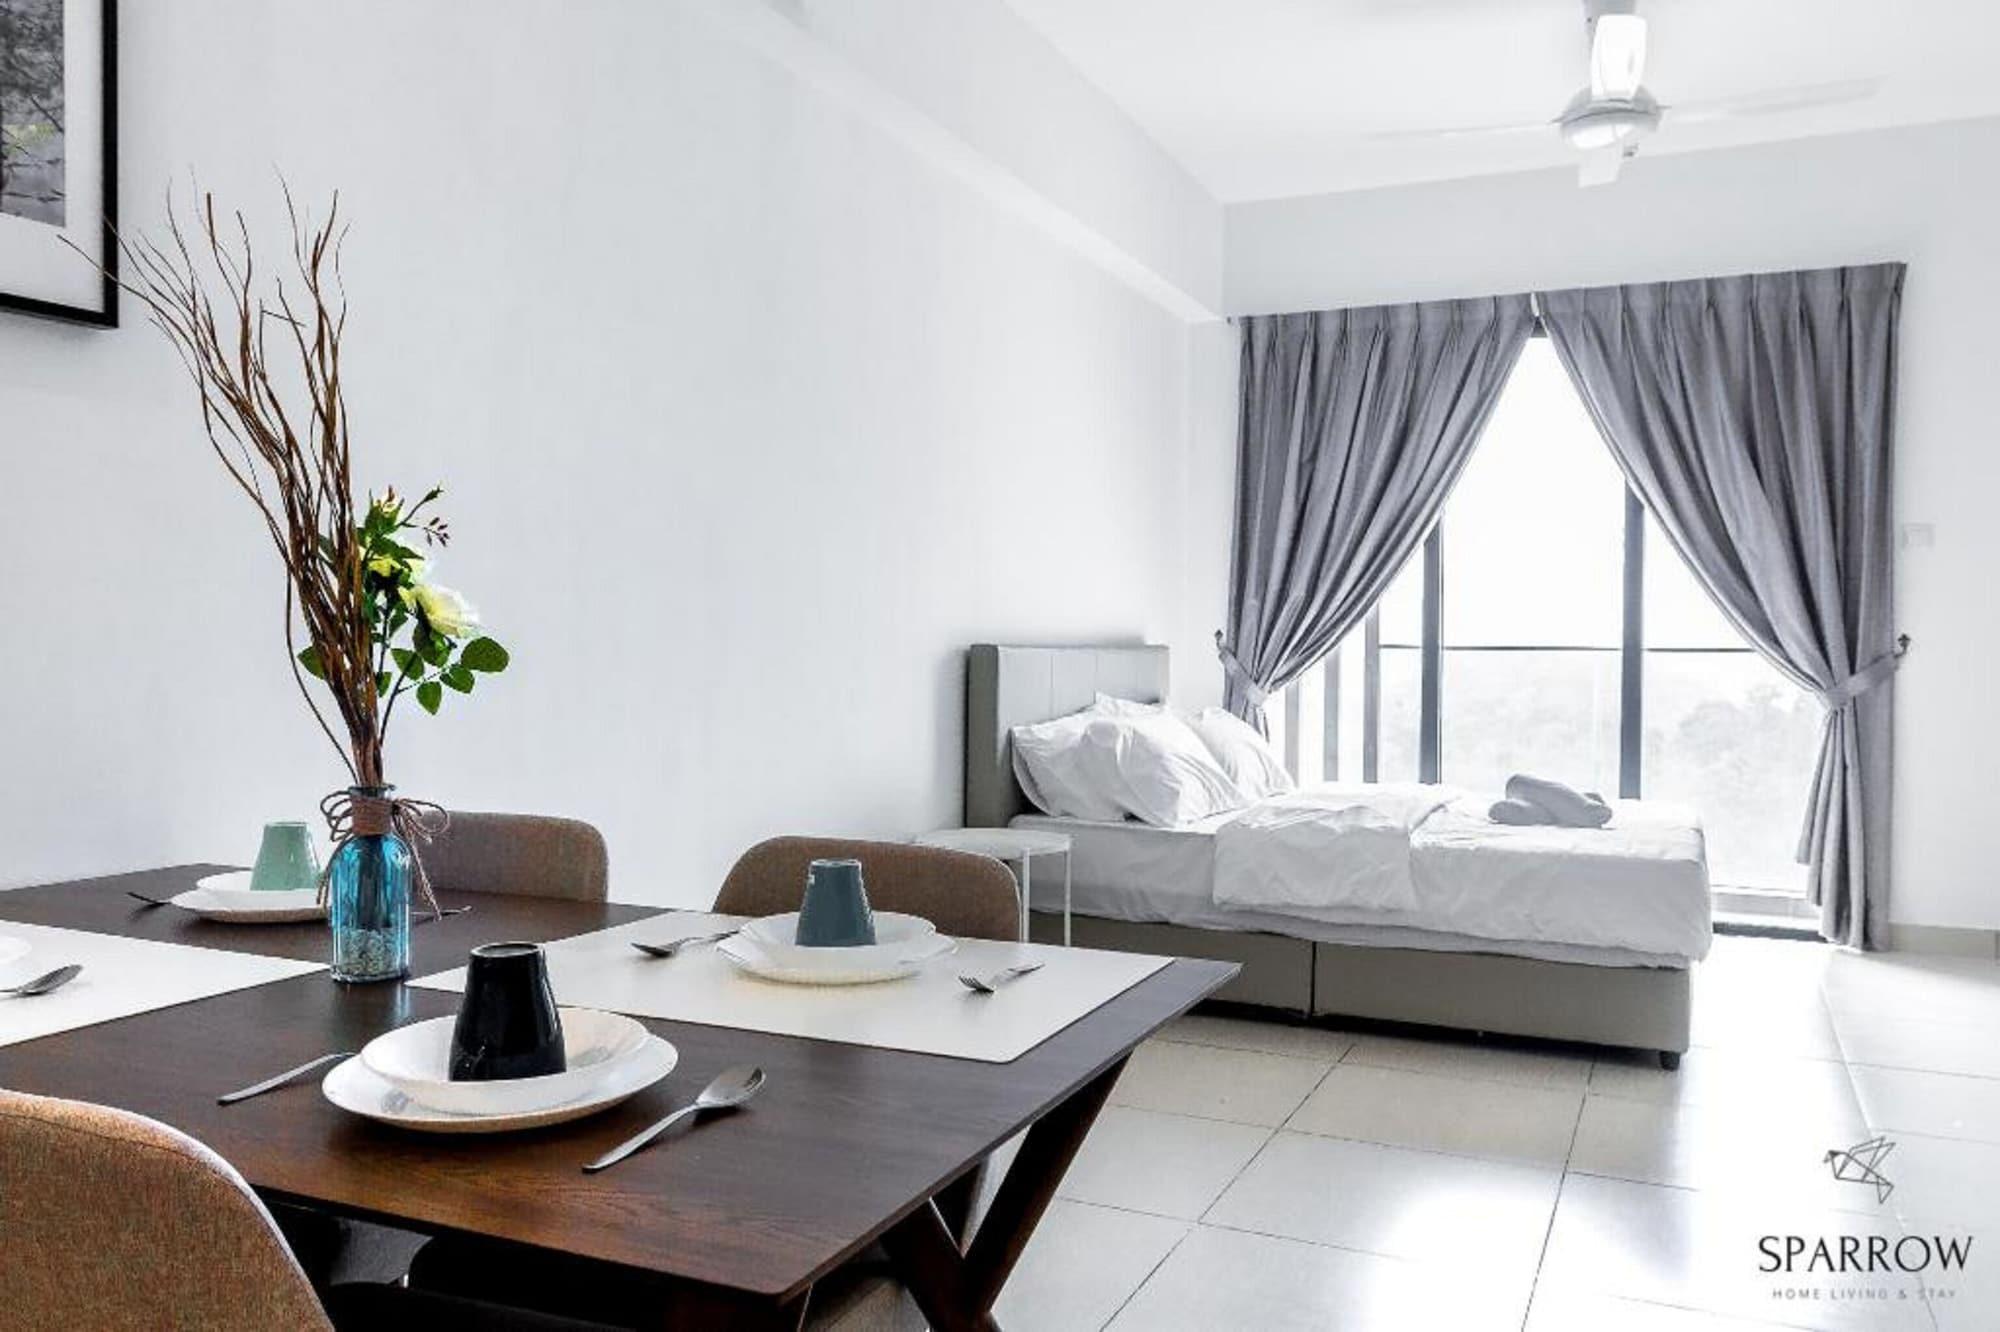 Midhills Premium Suites by Sparrow Homes, Bentong